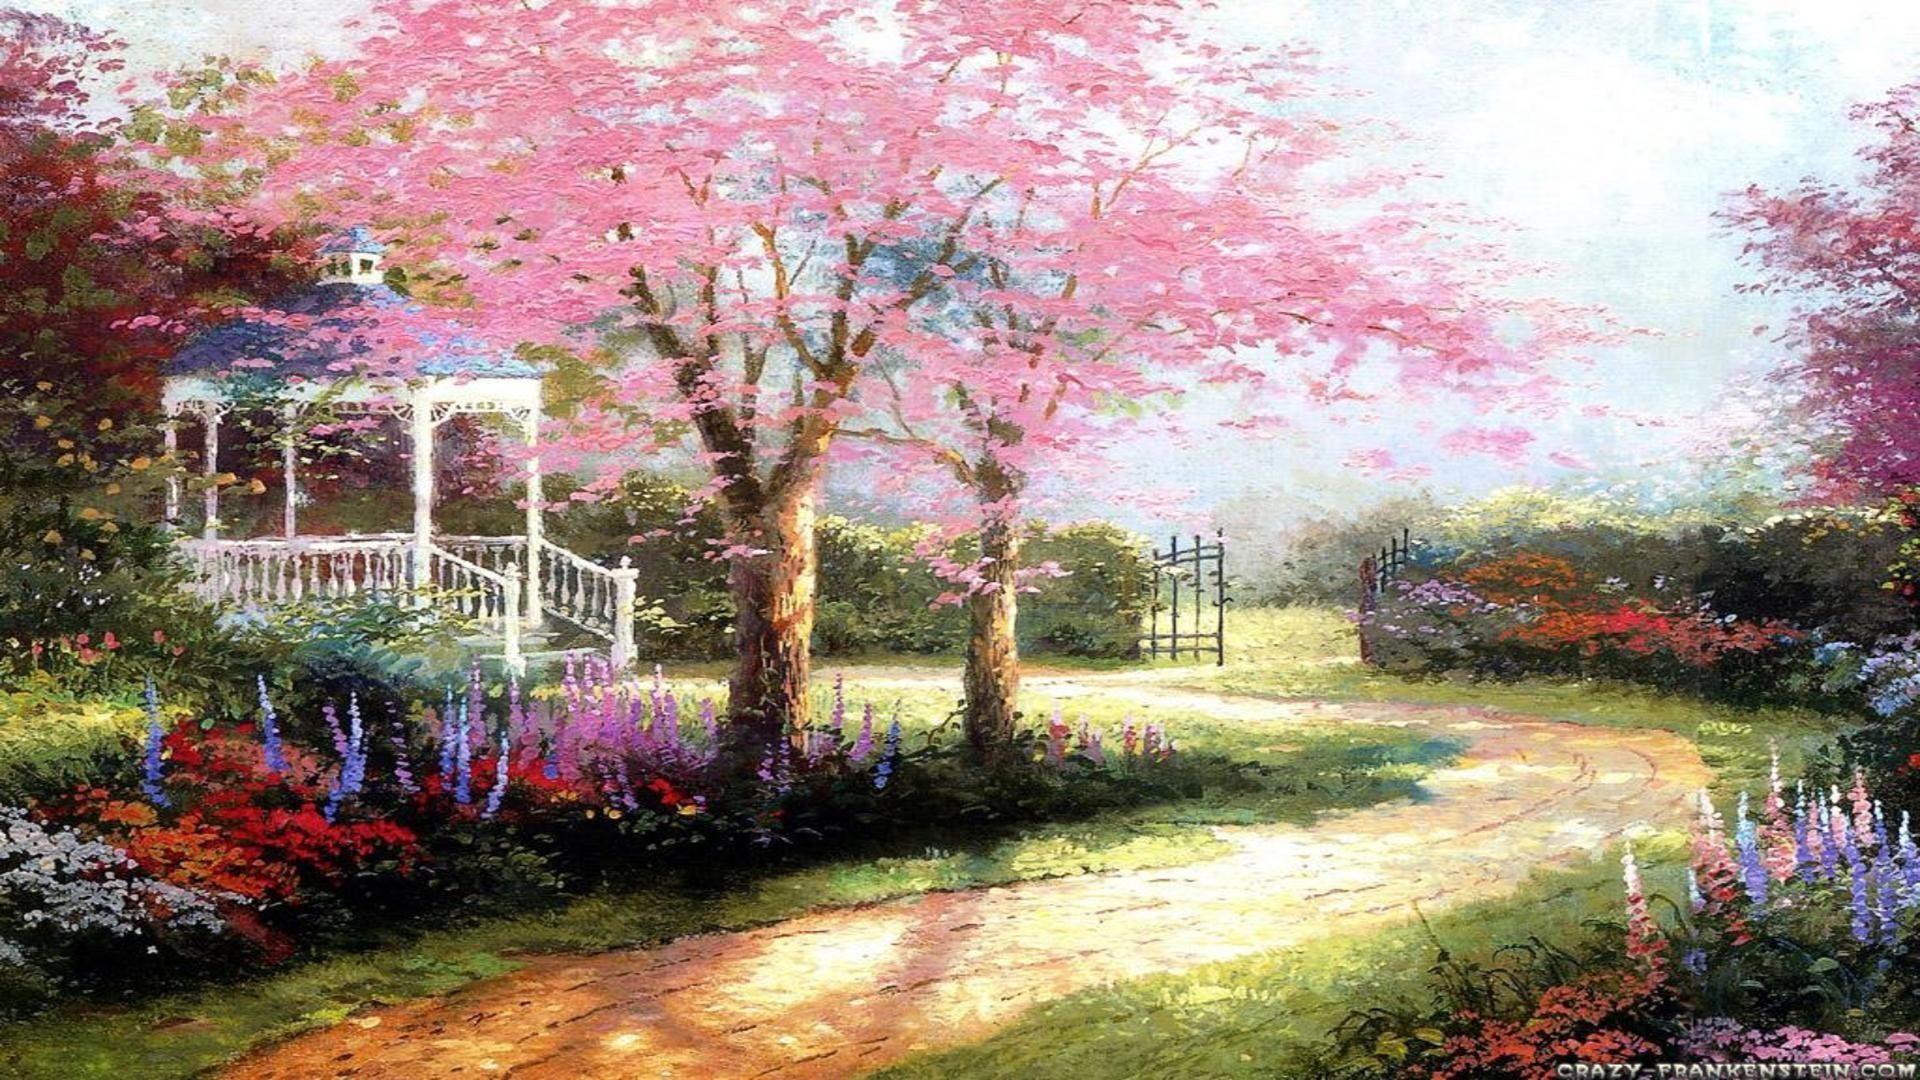 45 spring desktop backgrounds 183�� download free amazing